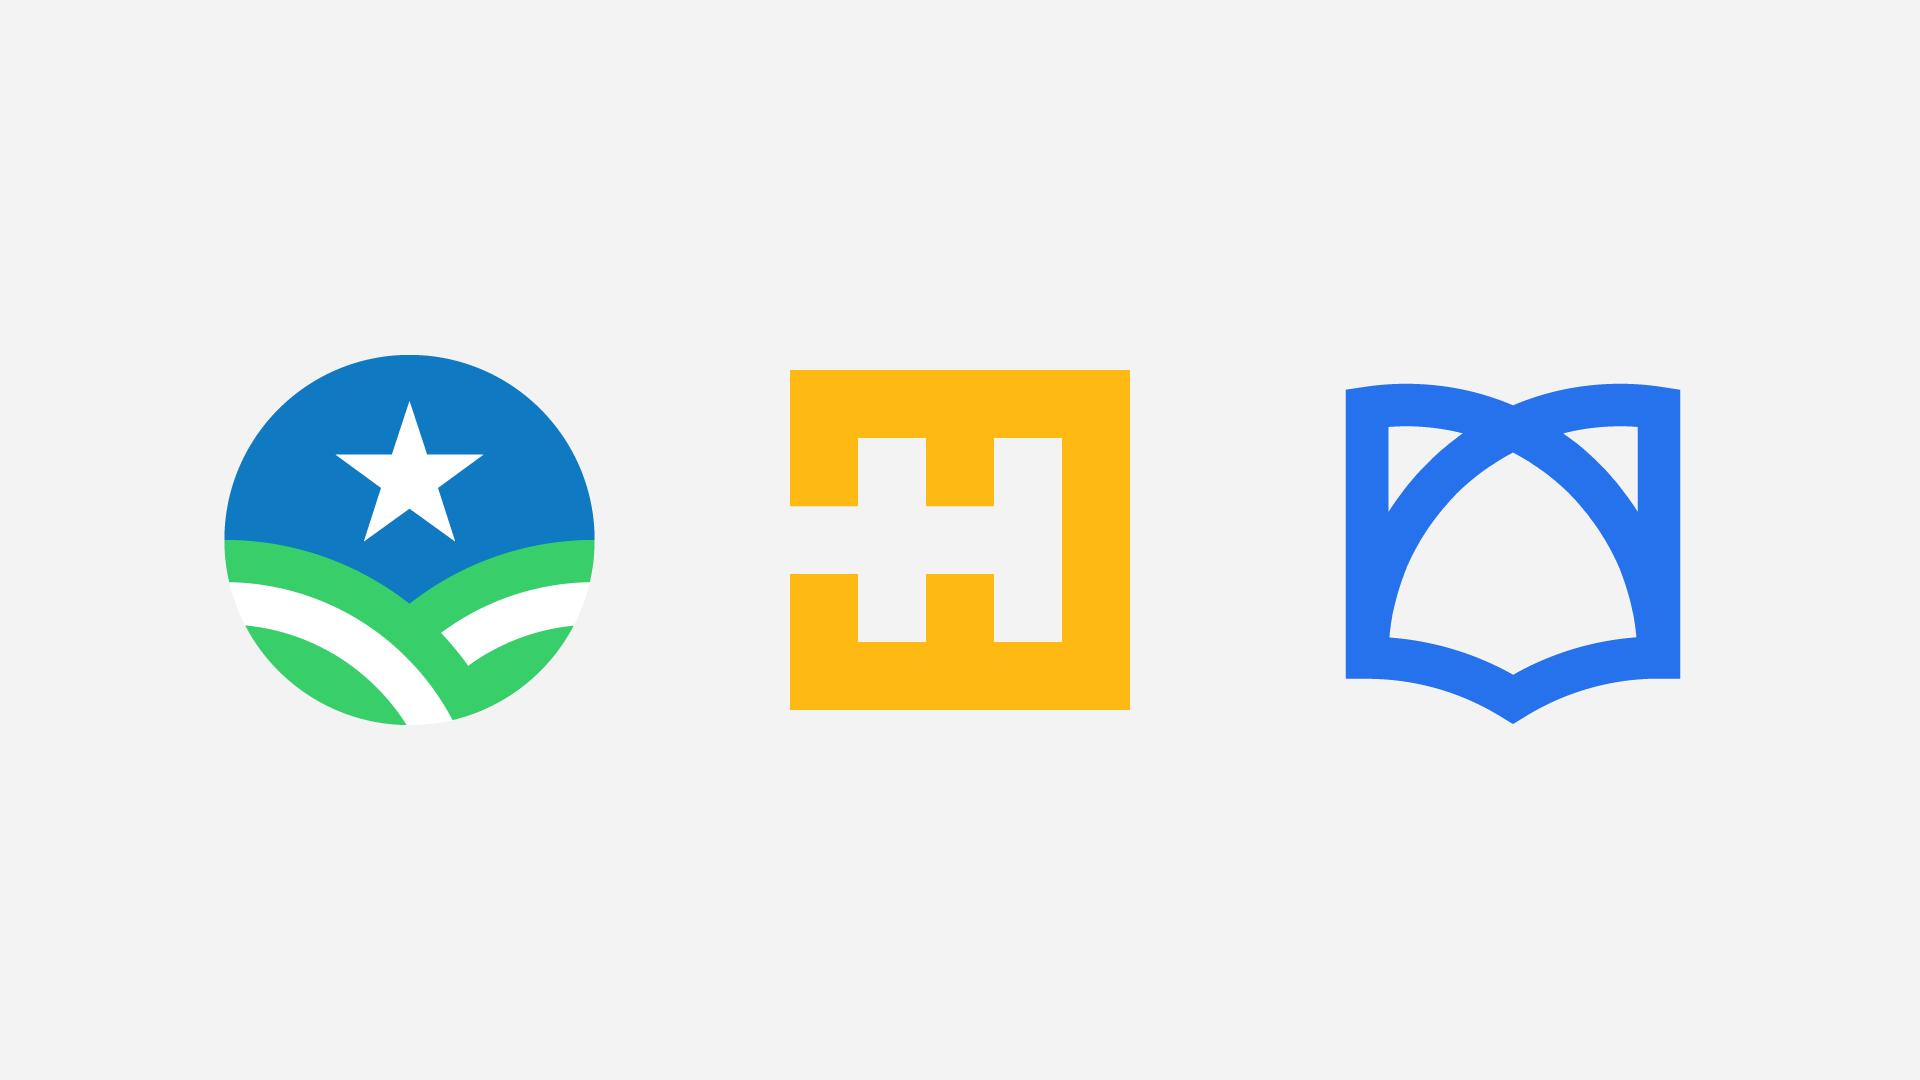 Modern Brandmark Logos